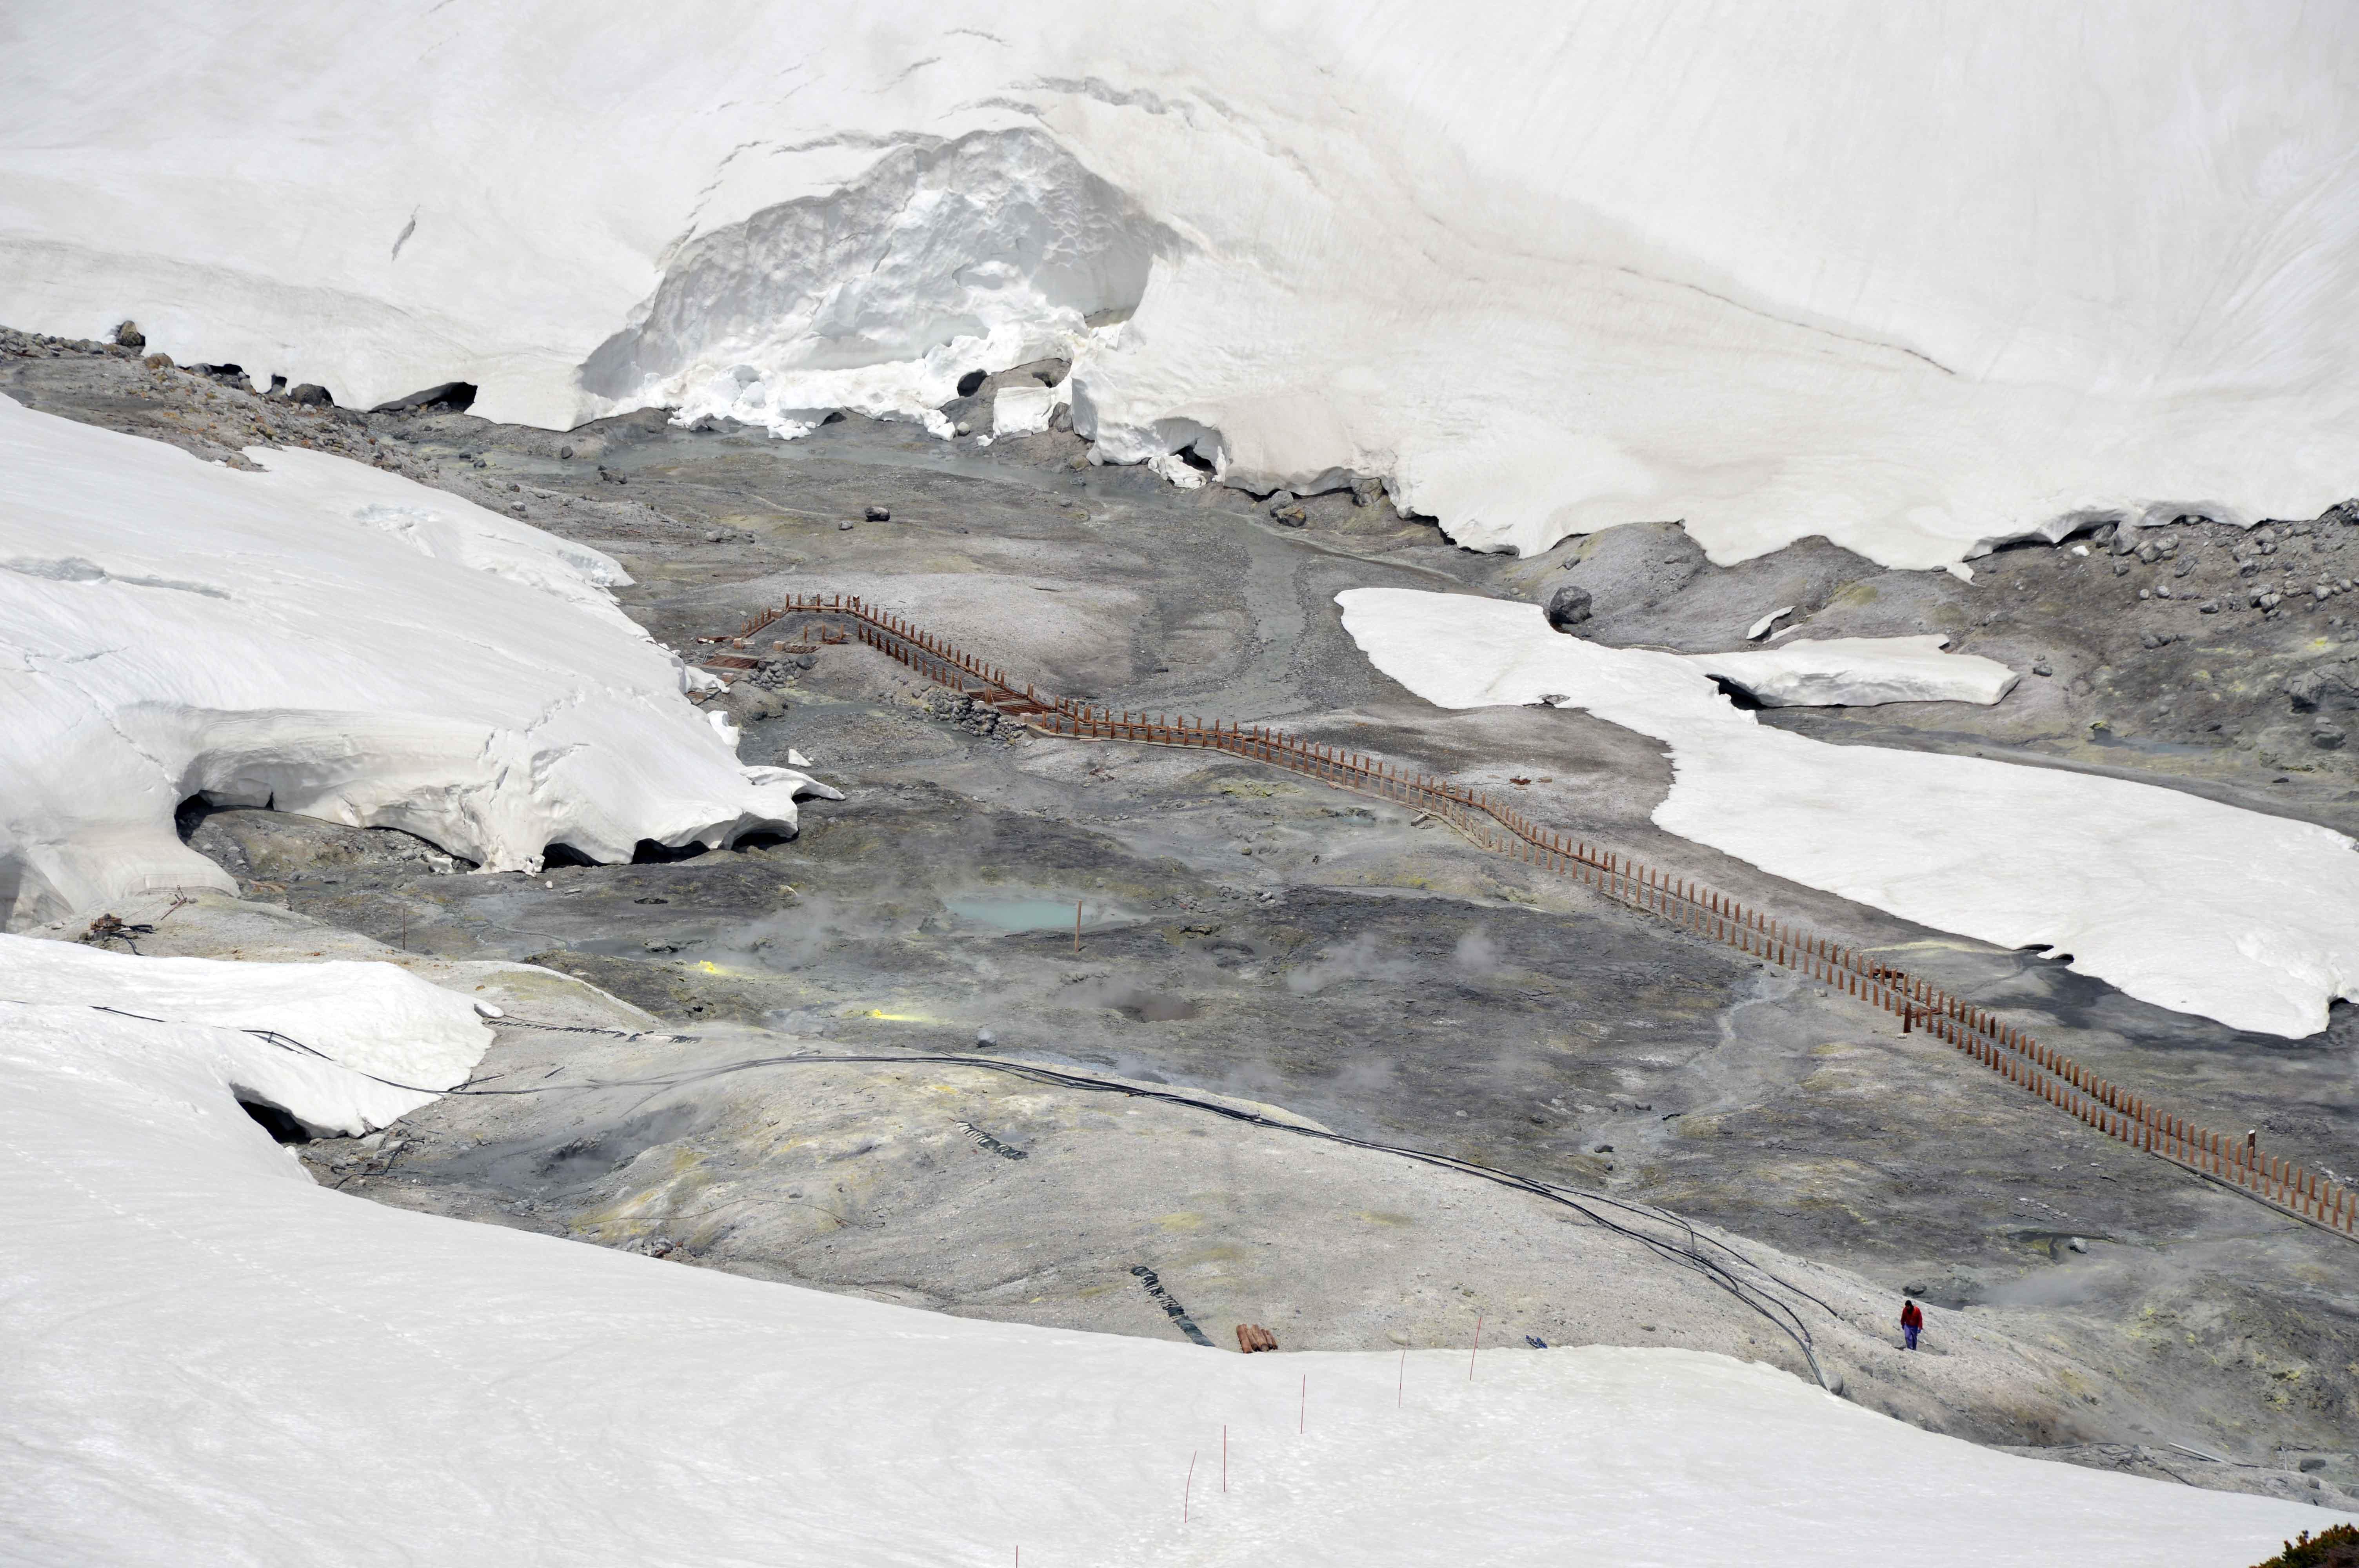 jigokudani (hell valley) dilihat dari atas